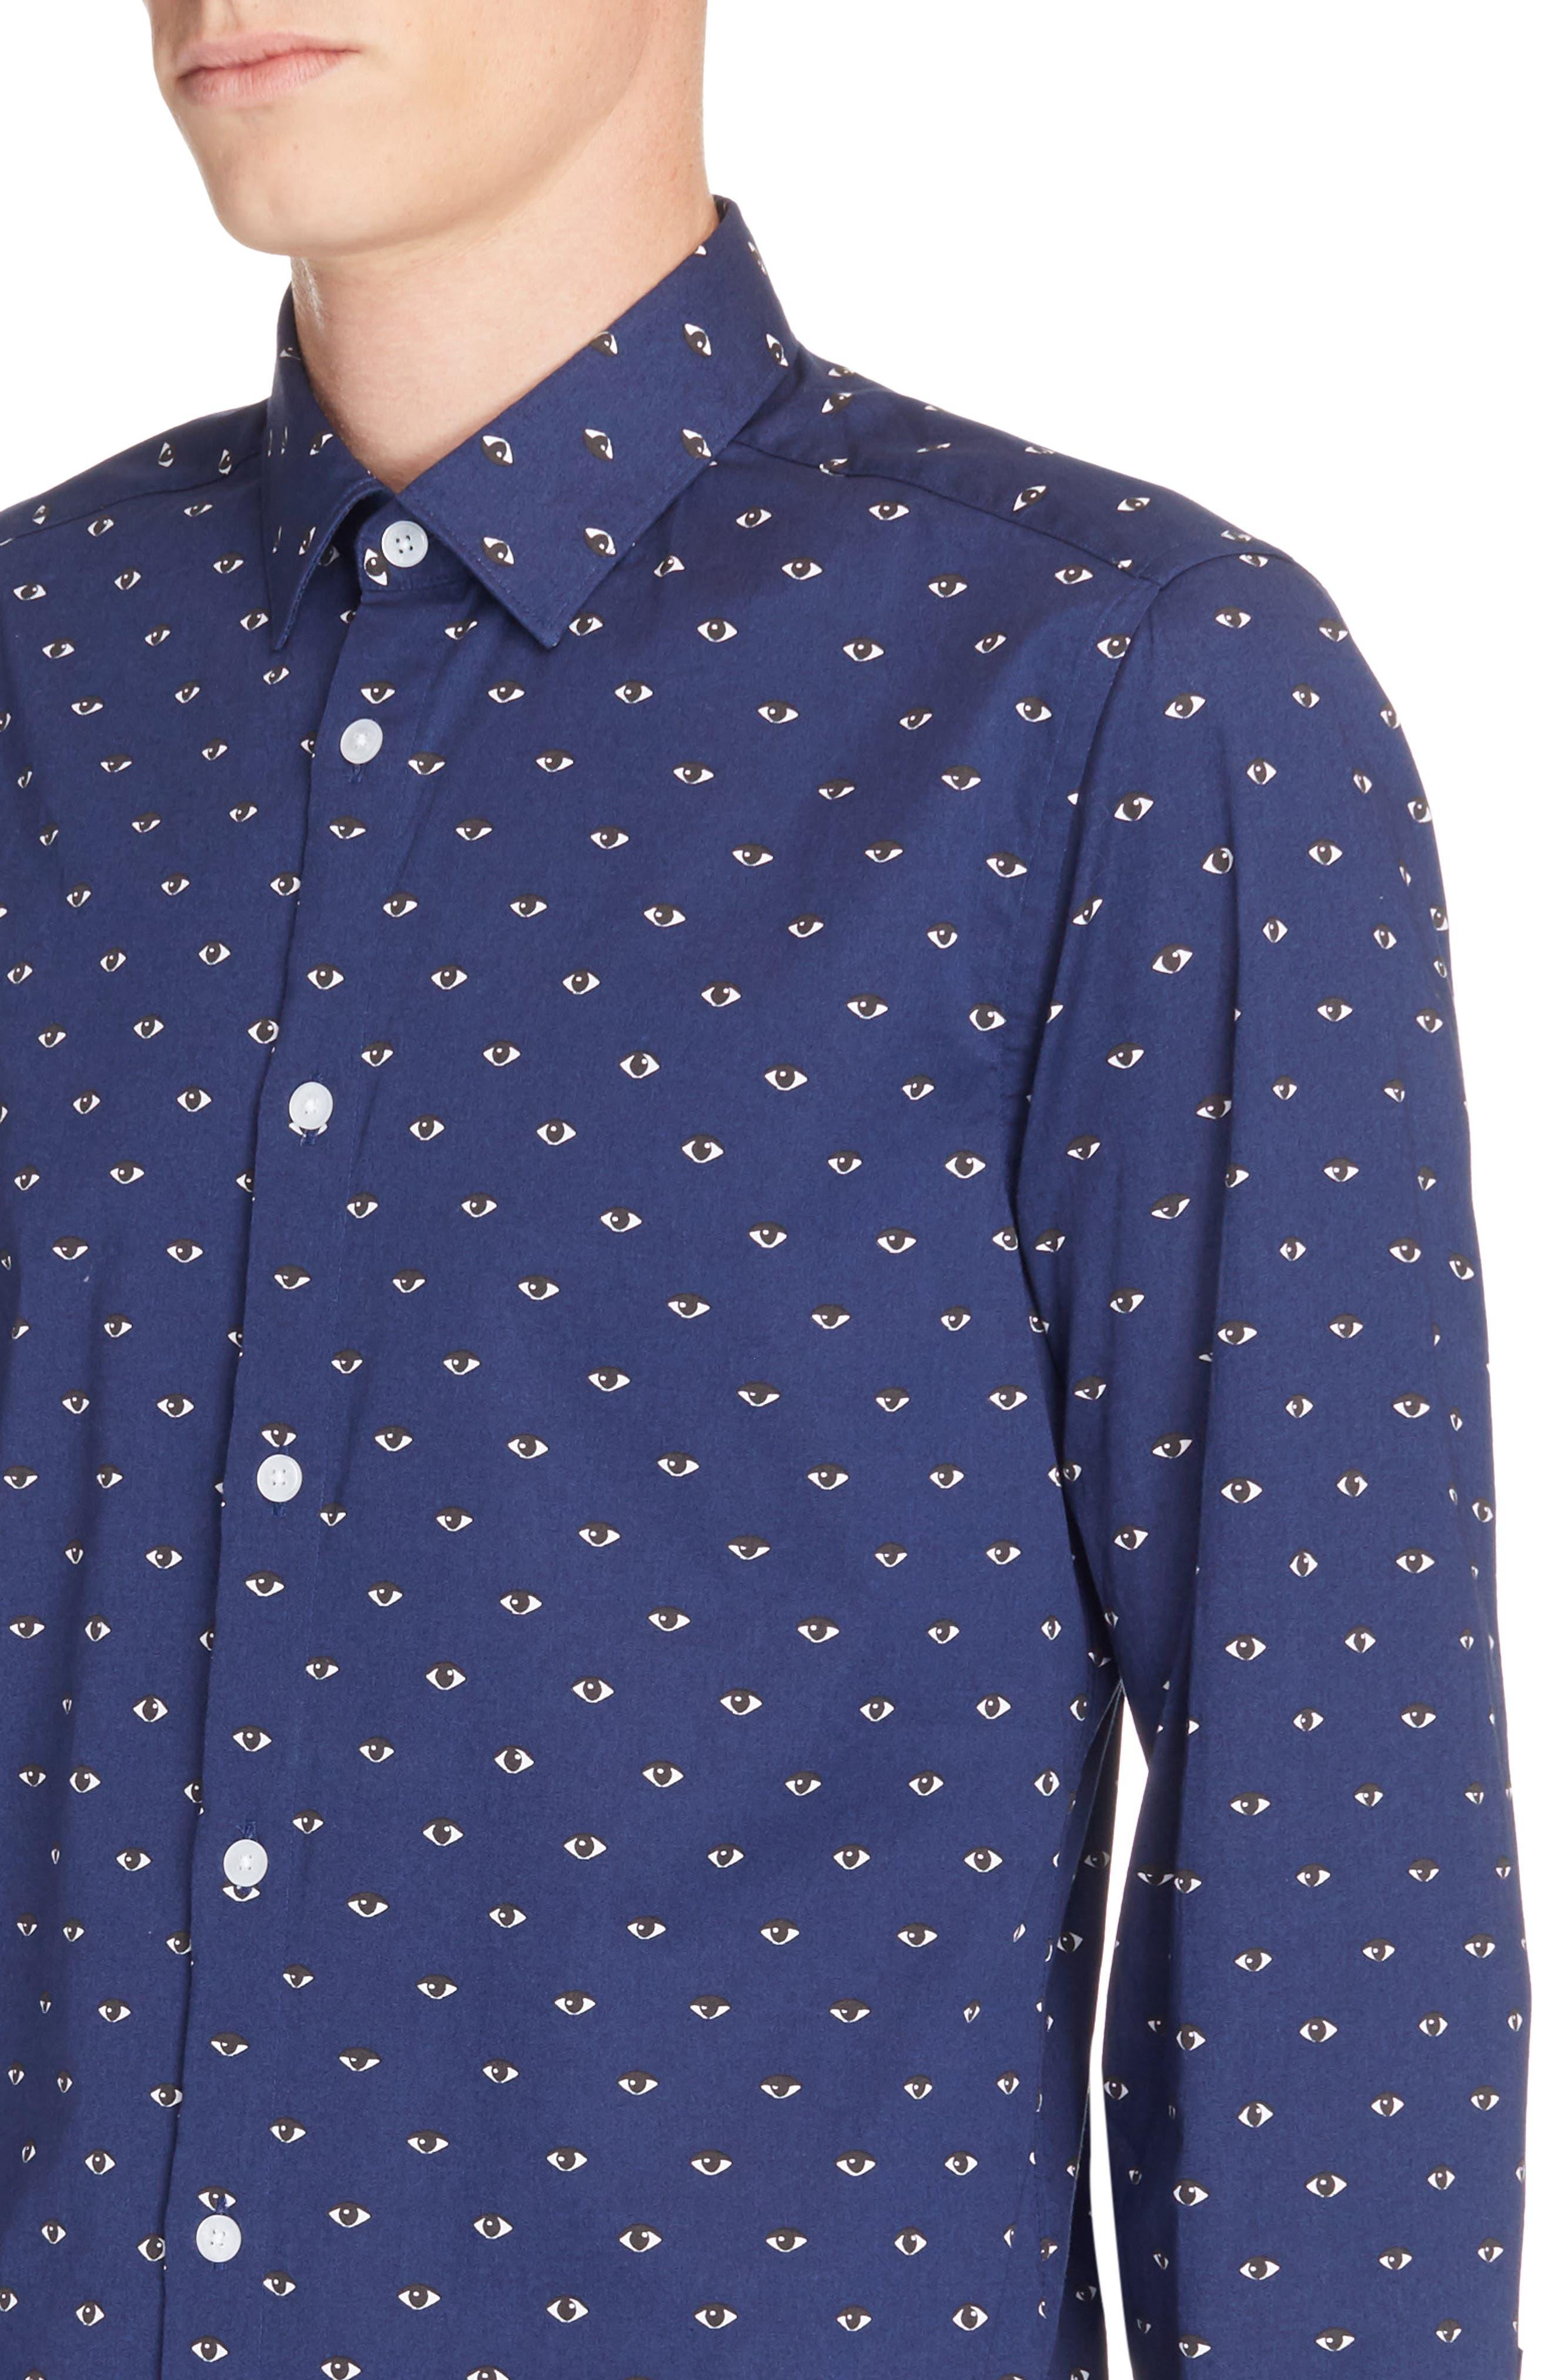 Allover Eye Print Woven Shirt,                             Alternate thumbnail 2, color,                             Navy Blue